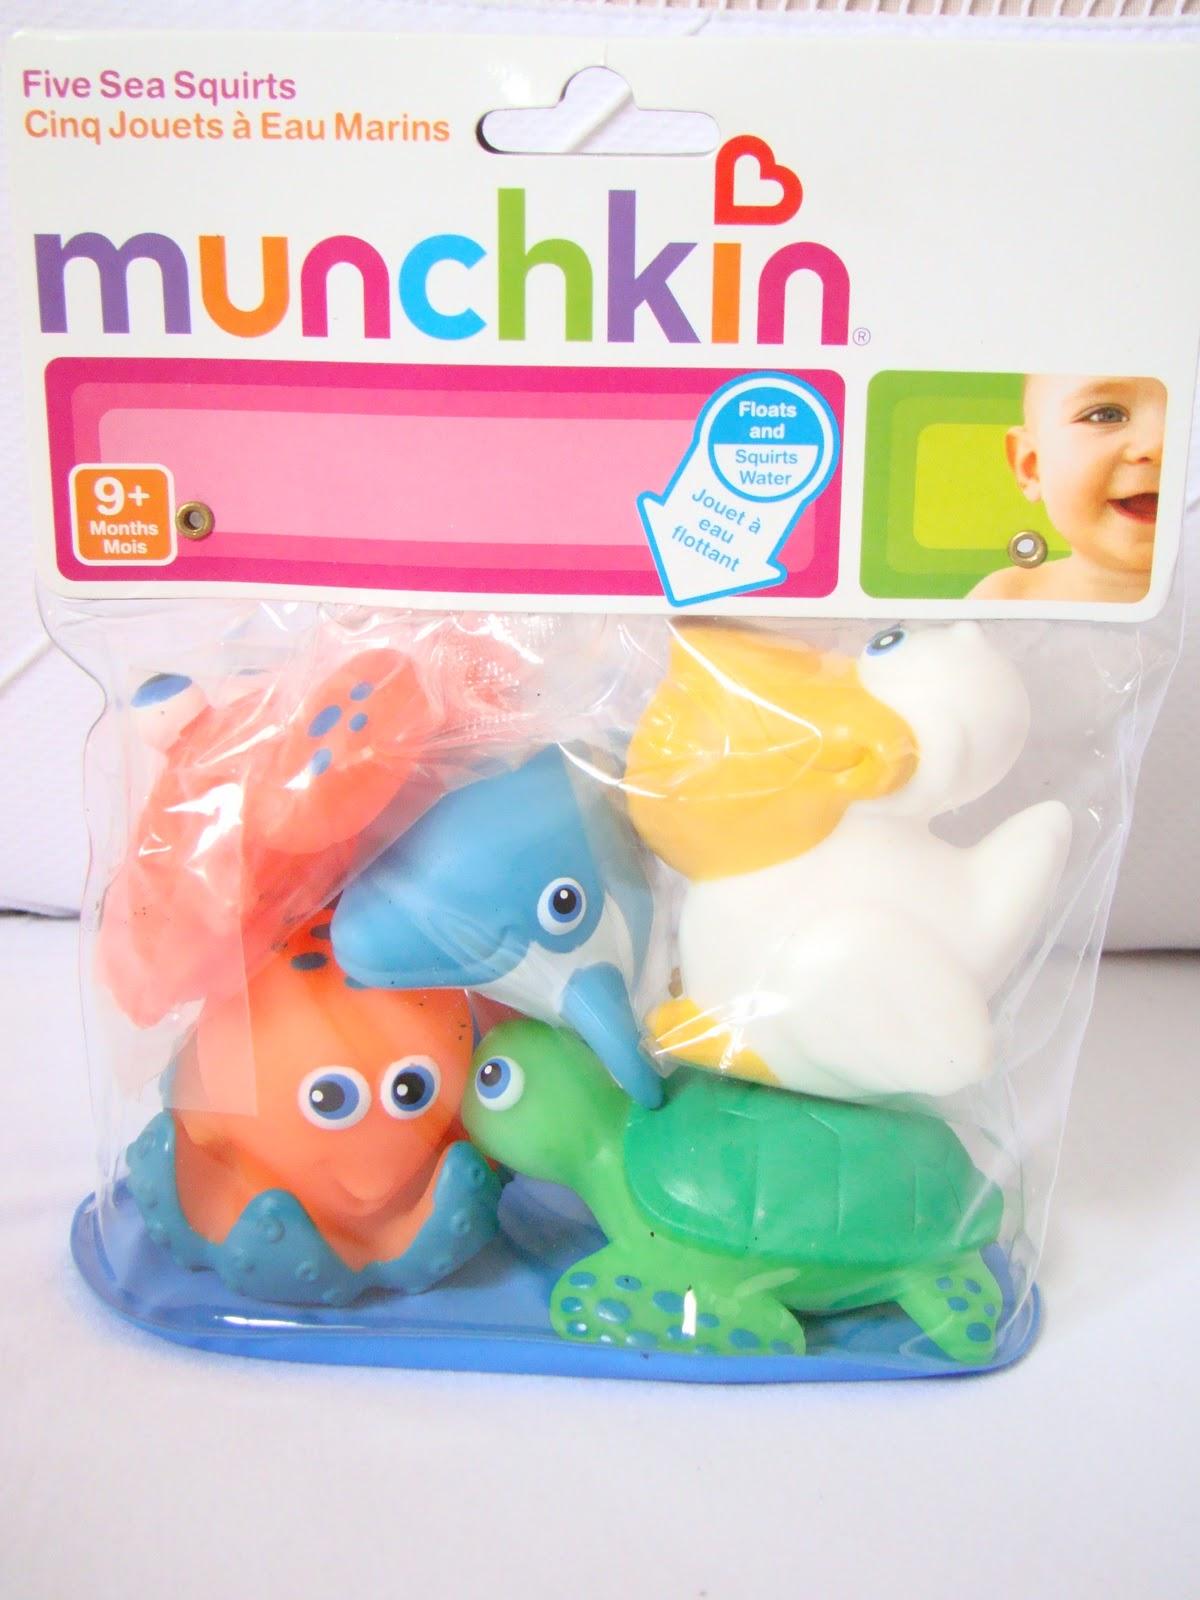 Bichinhos para Banho Munchkin Vida Materna #BF750C 1200x1600